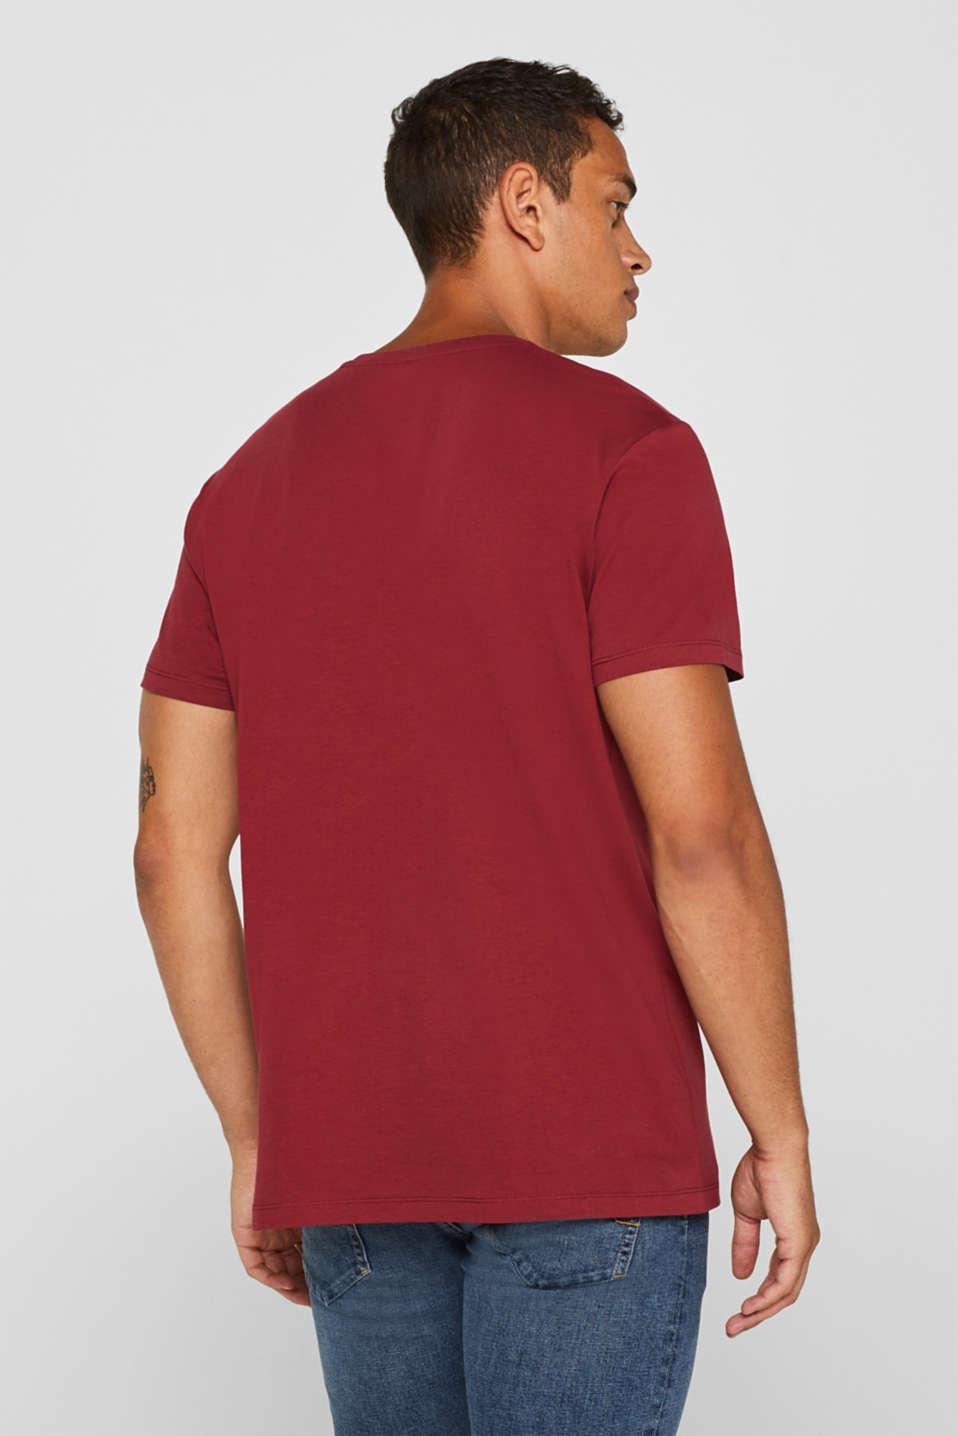 Jersey logo T-shirt, 100% cotton, BORDEAUX RED, detail image number 3